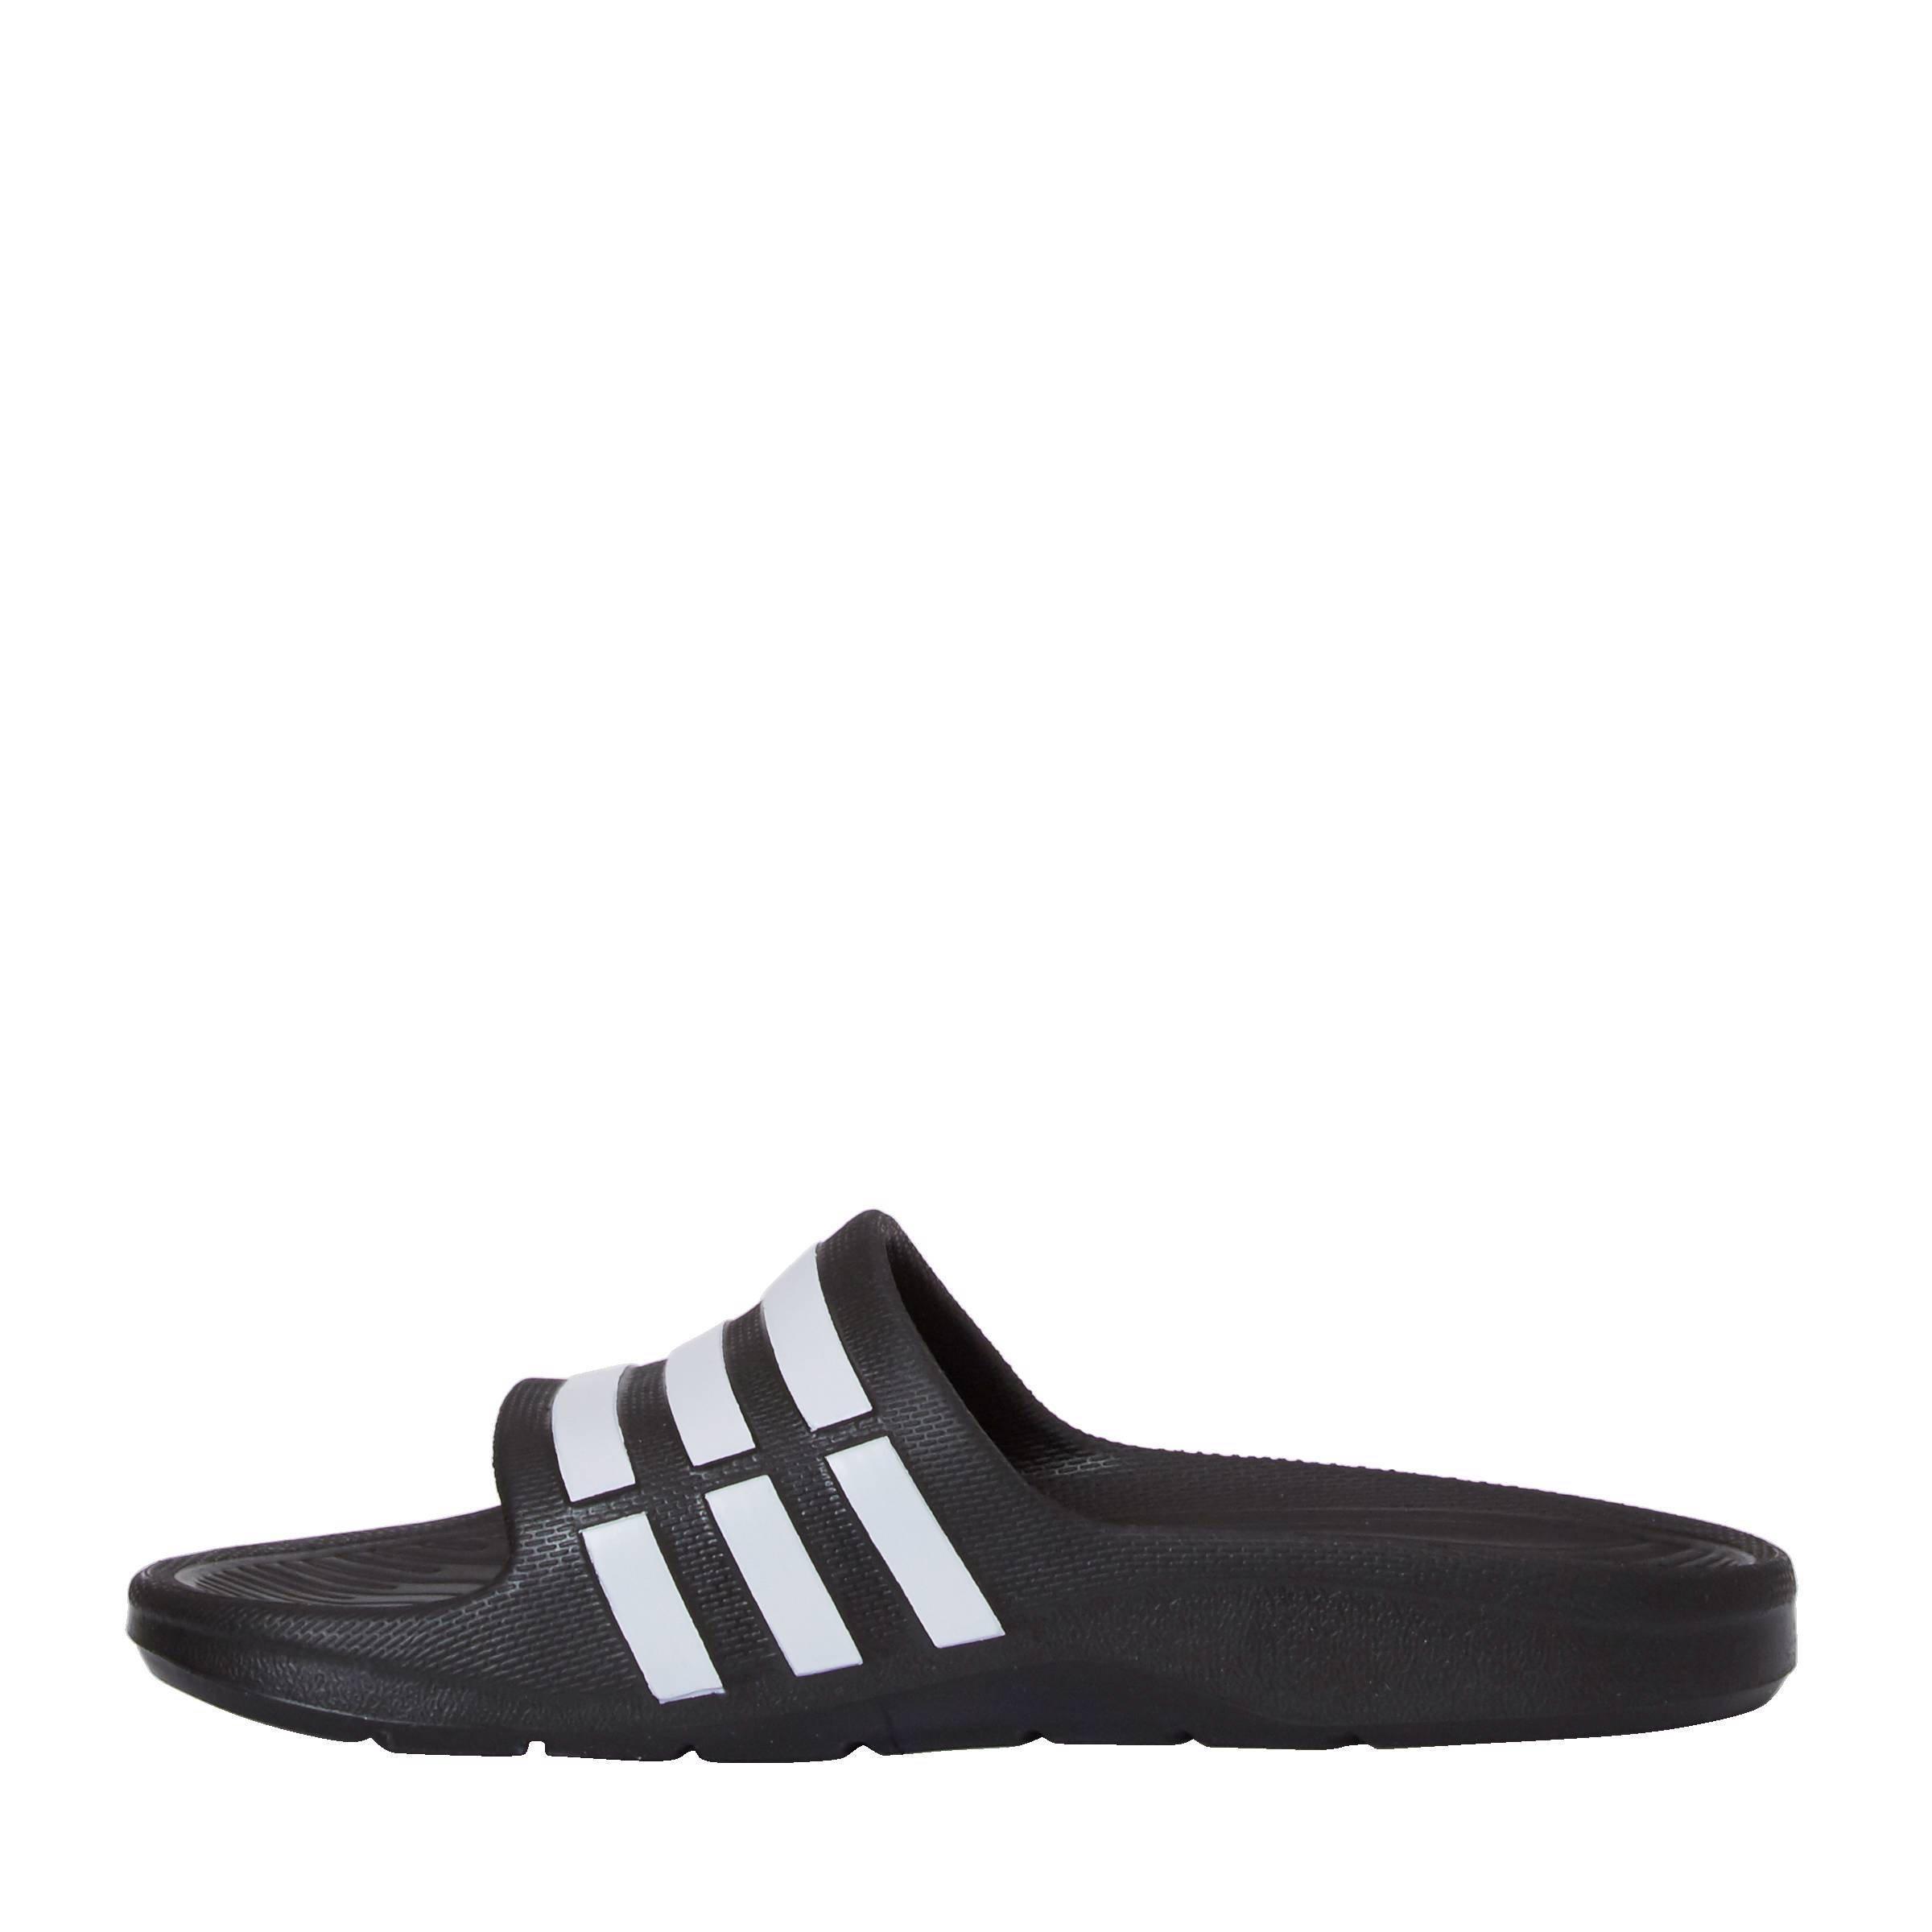 Duramo Pantoufles Adidas k0m25ghl4s